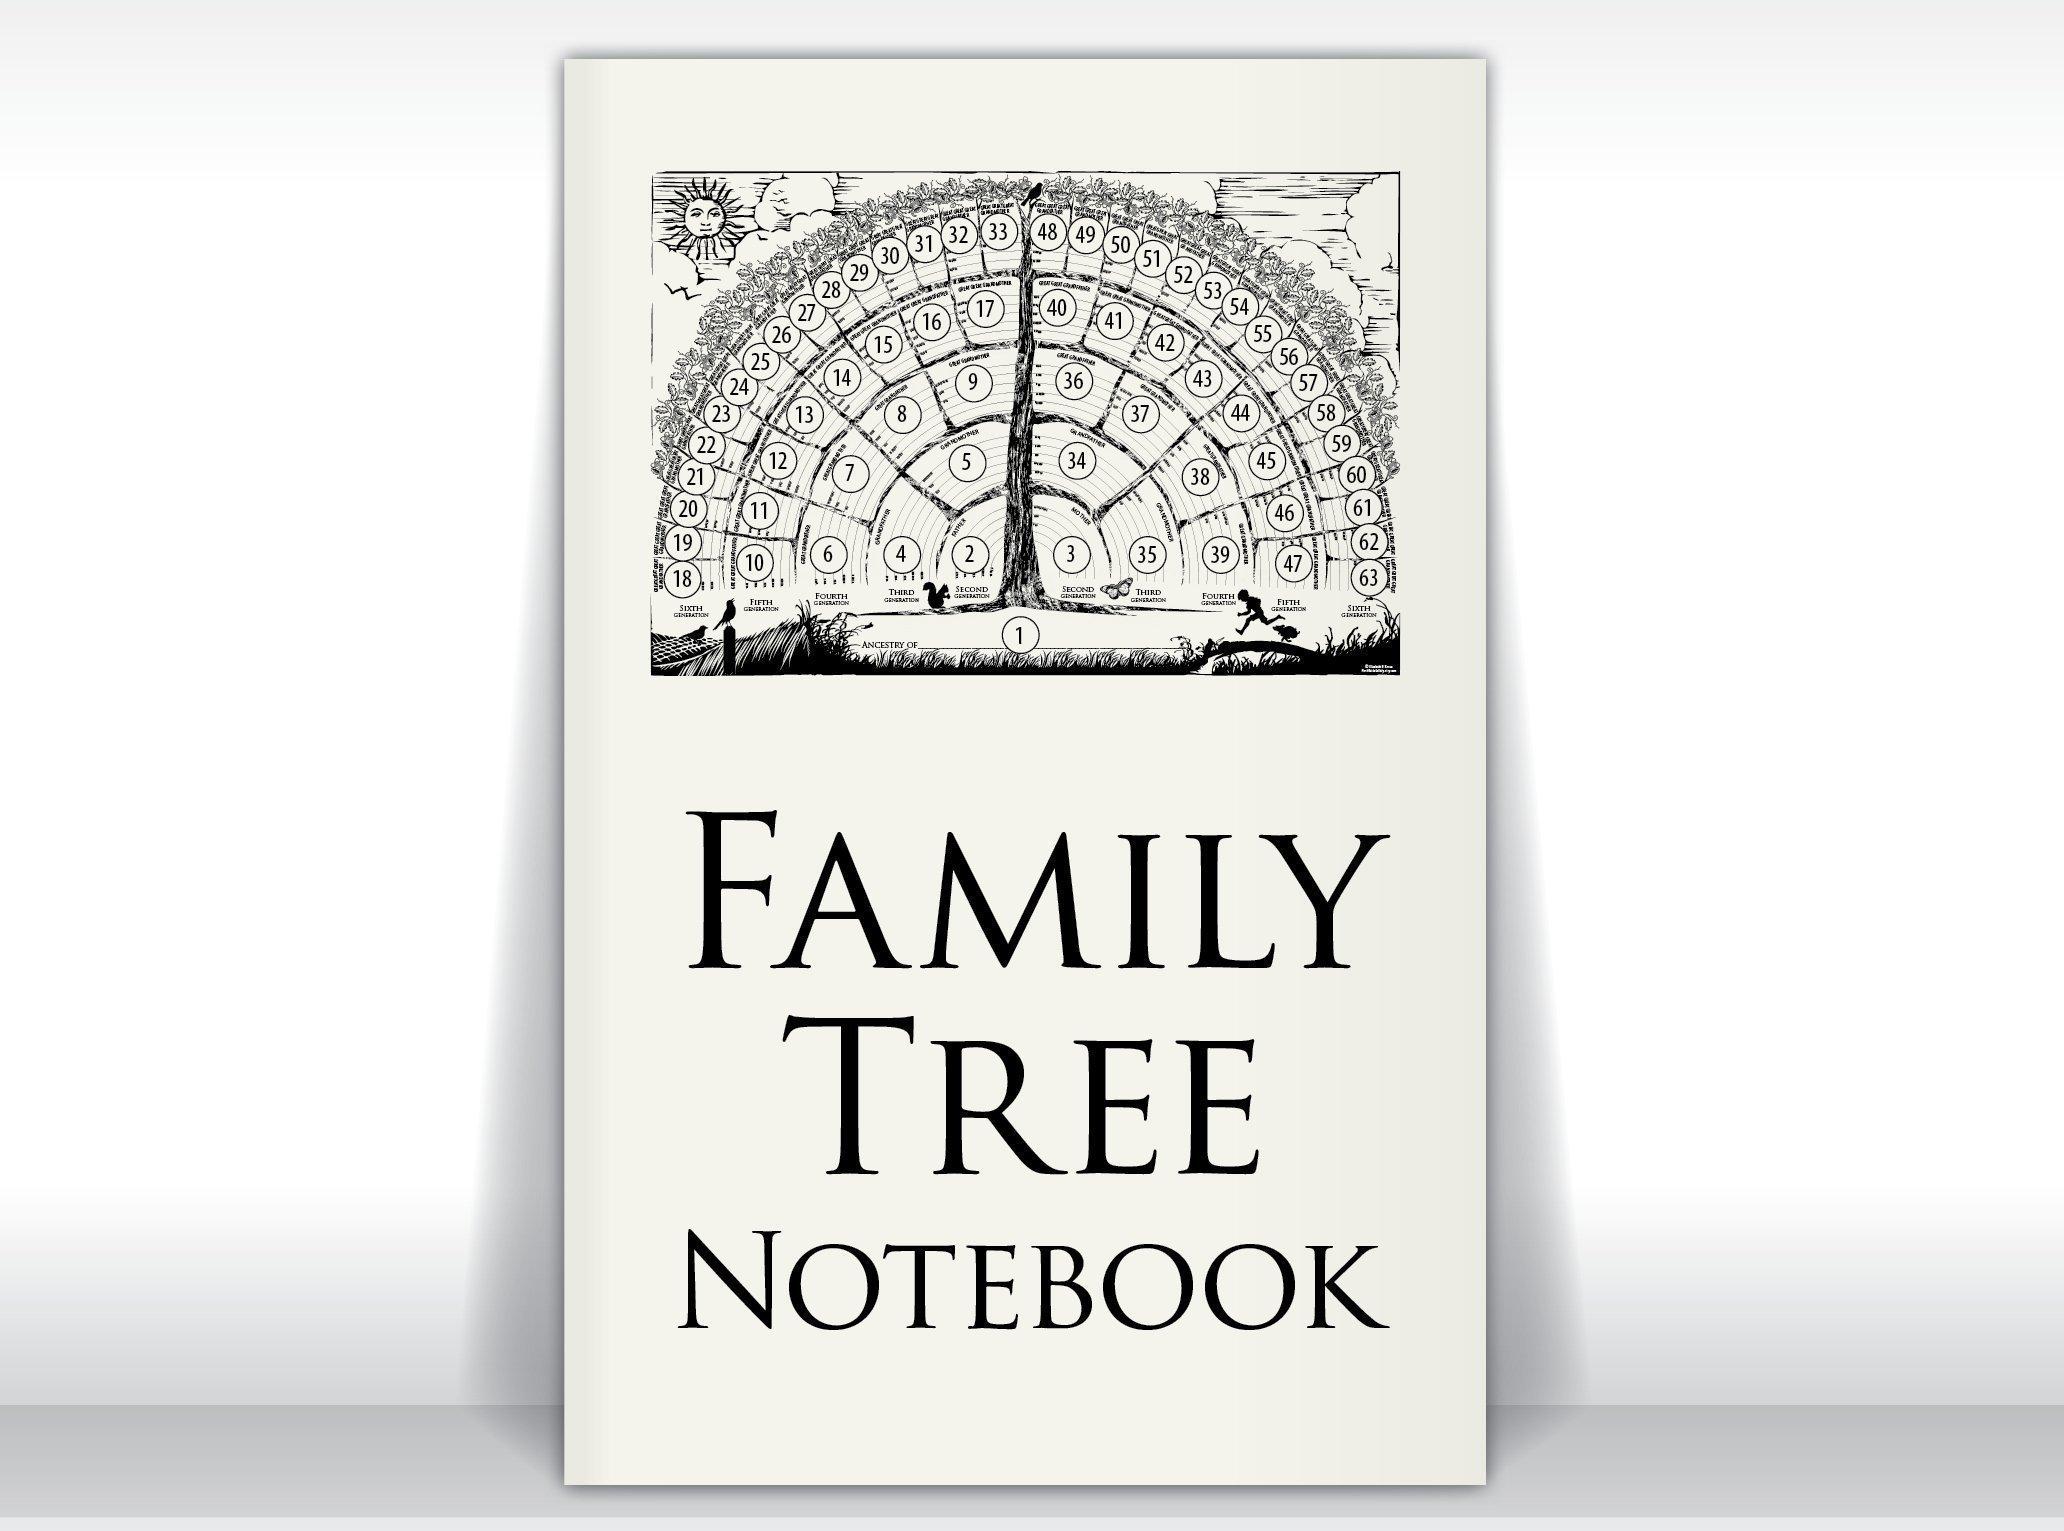 Family Tree Notebook, 2-books-per-order gifts for baby, men, women, grandparents, in-laws, children for genealogy memories/ancestor stories. by FreshRetroGallery